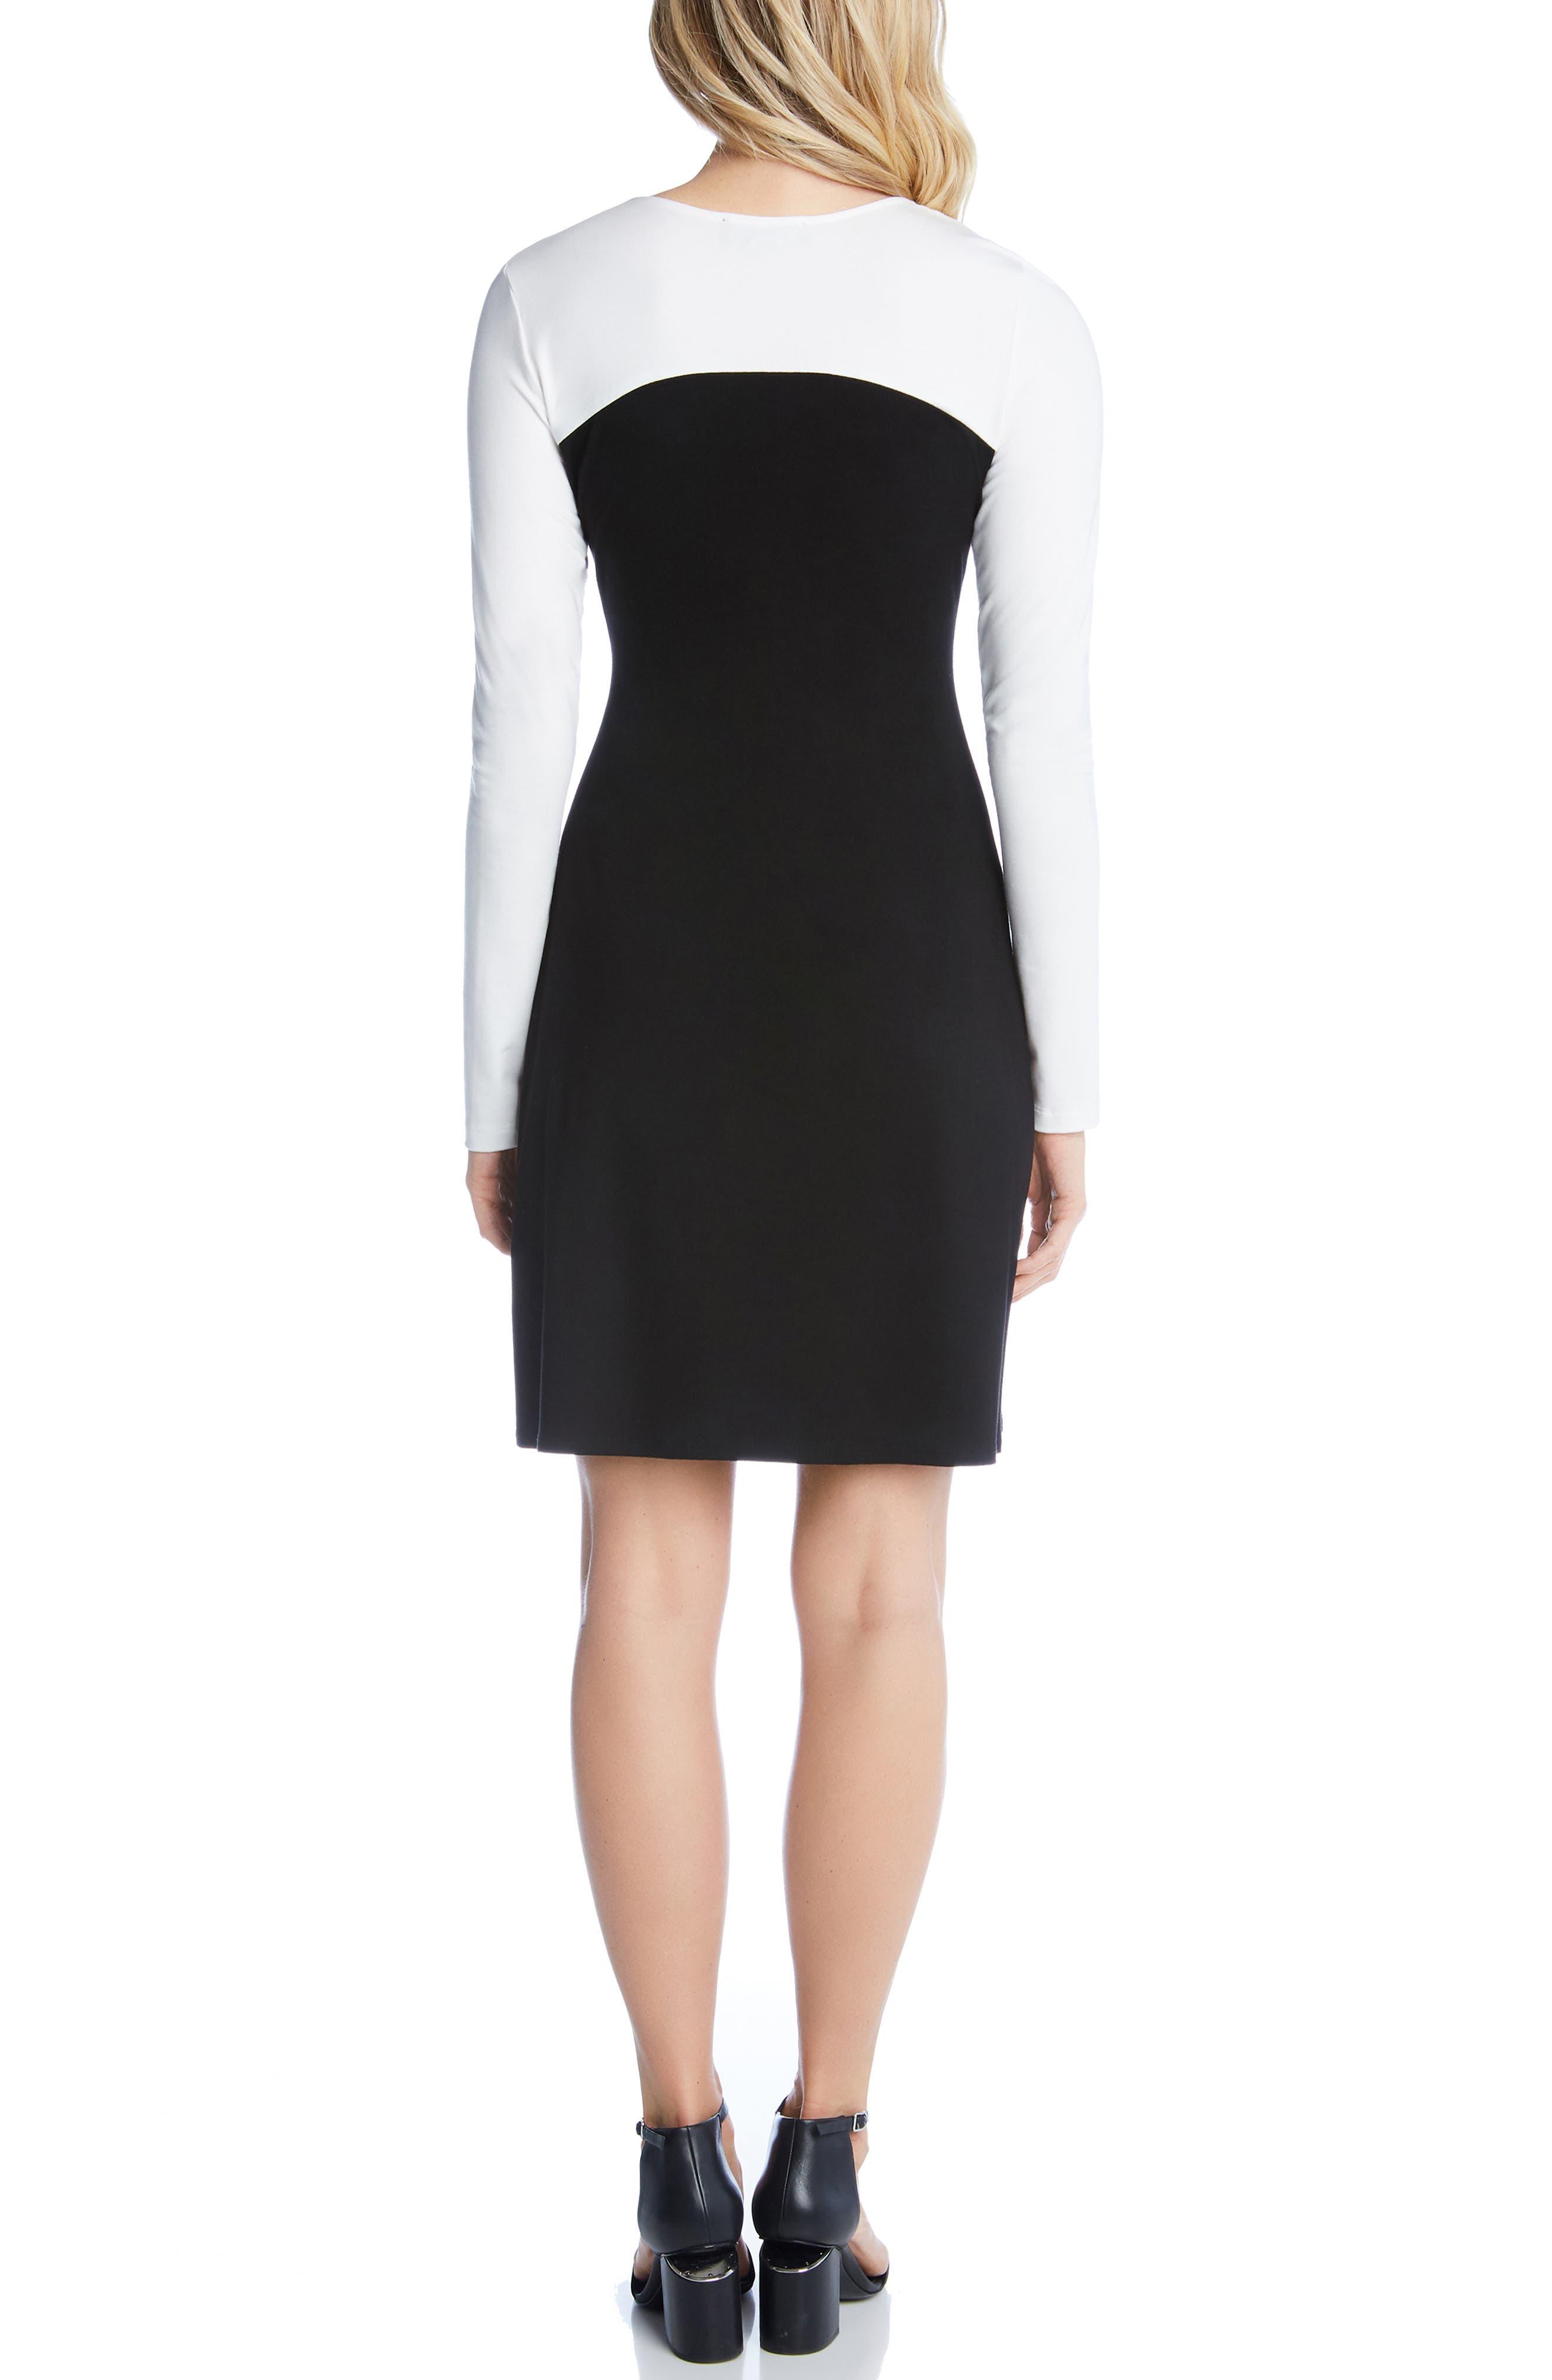 KAREN KANE, Colorblock Sheath Dress, Alternate thumbnail 2, color, BLACK WITH OFF WHITE